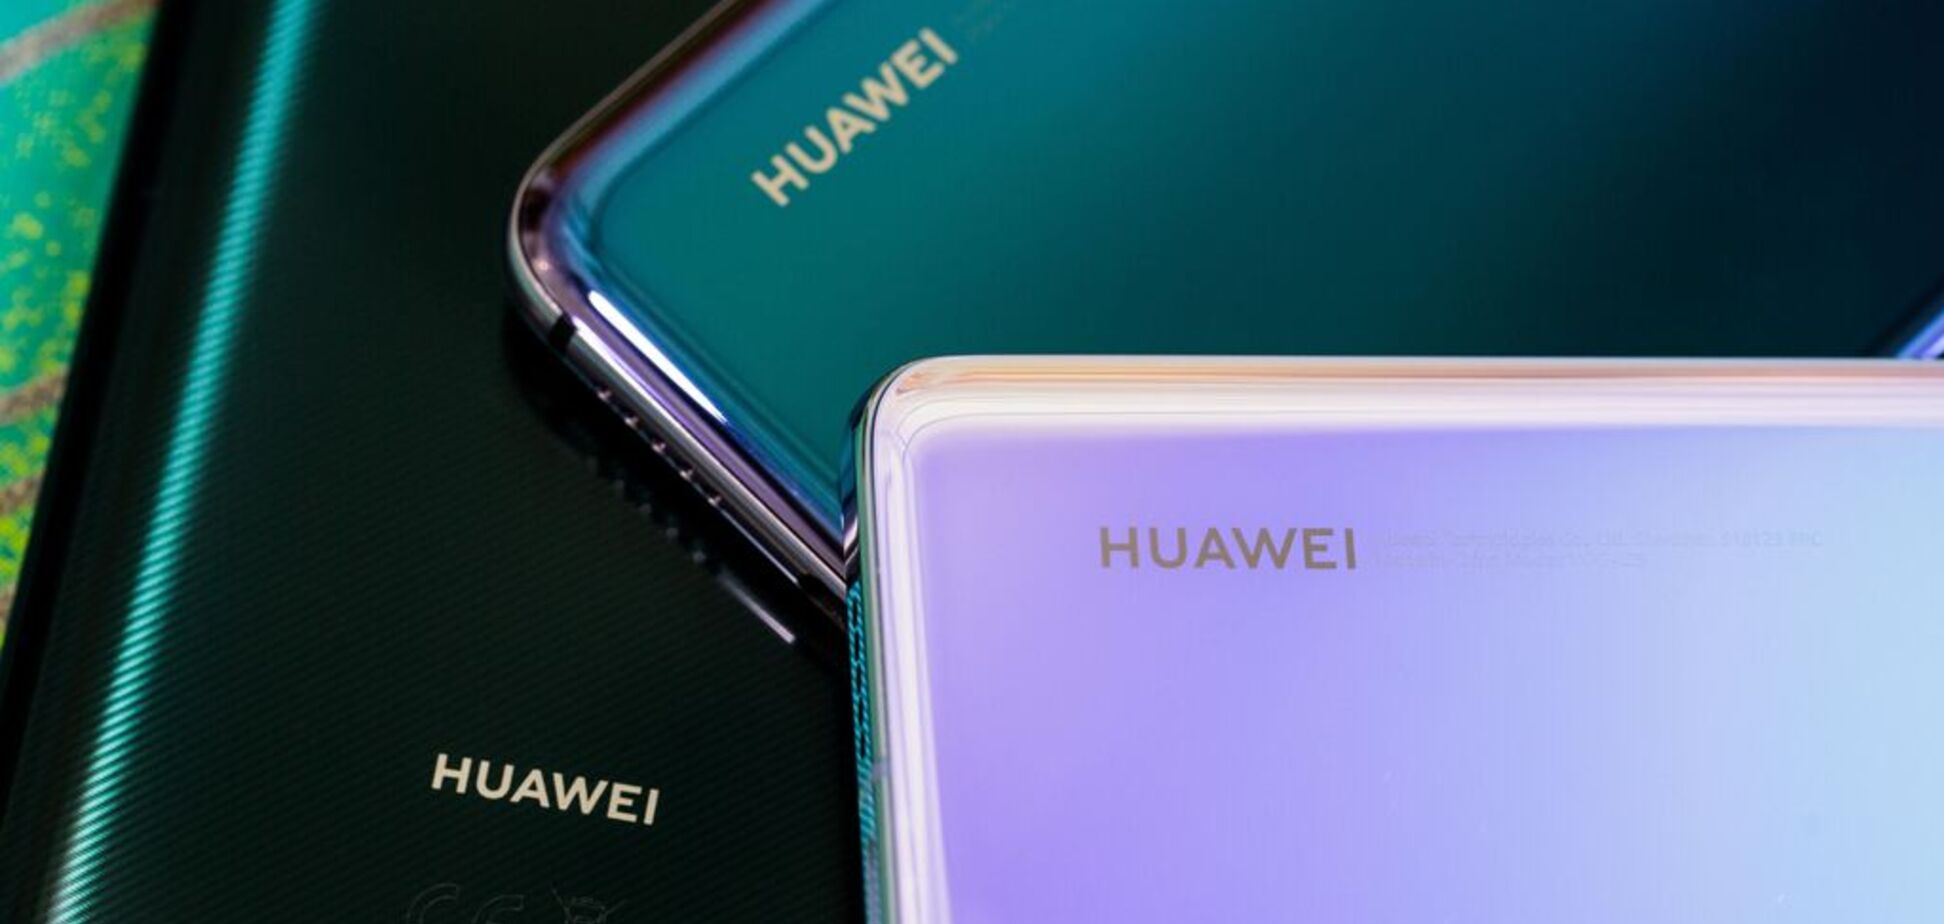 Huawei приостановил производство смартфонов: что произошло